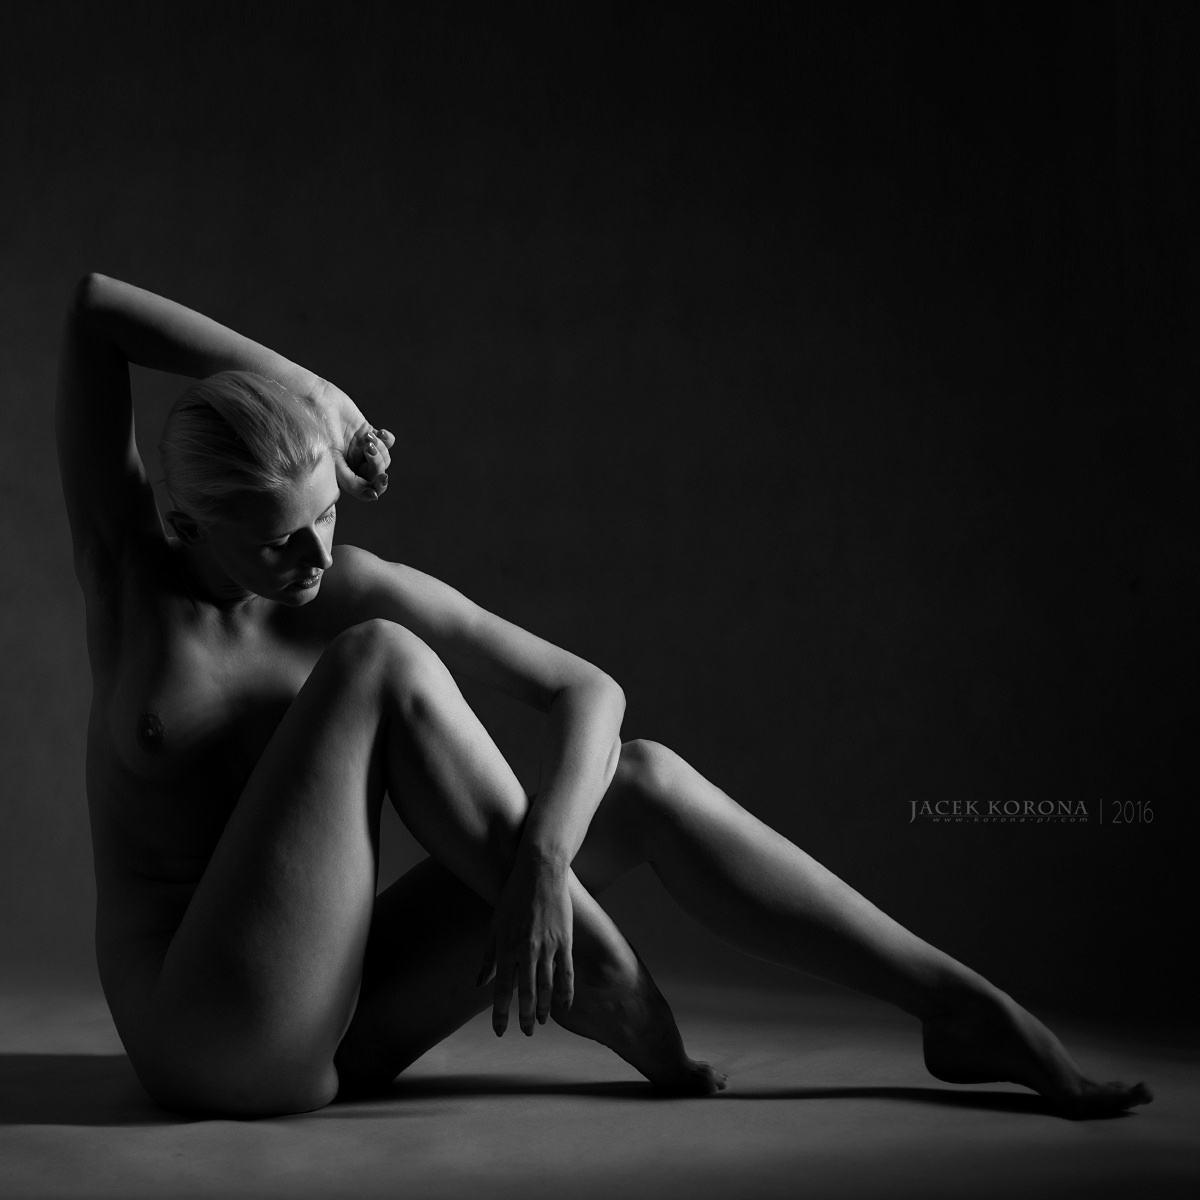 Sara by Jacek Korona